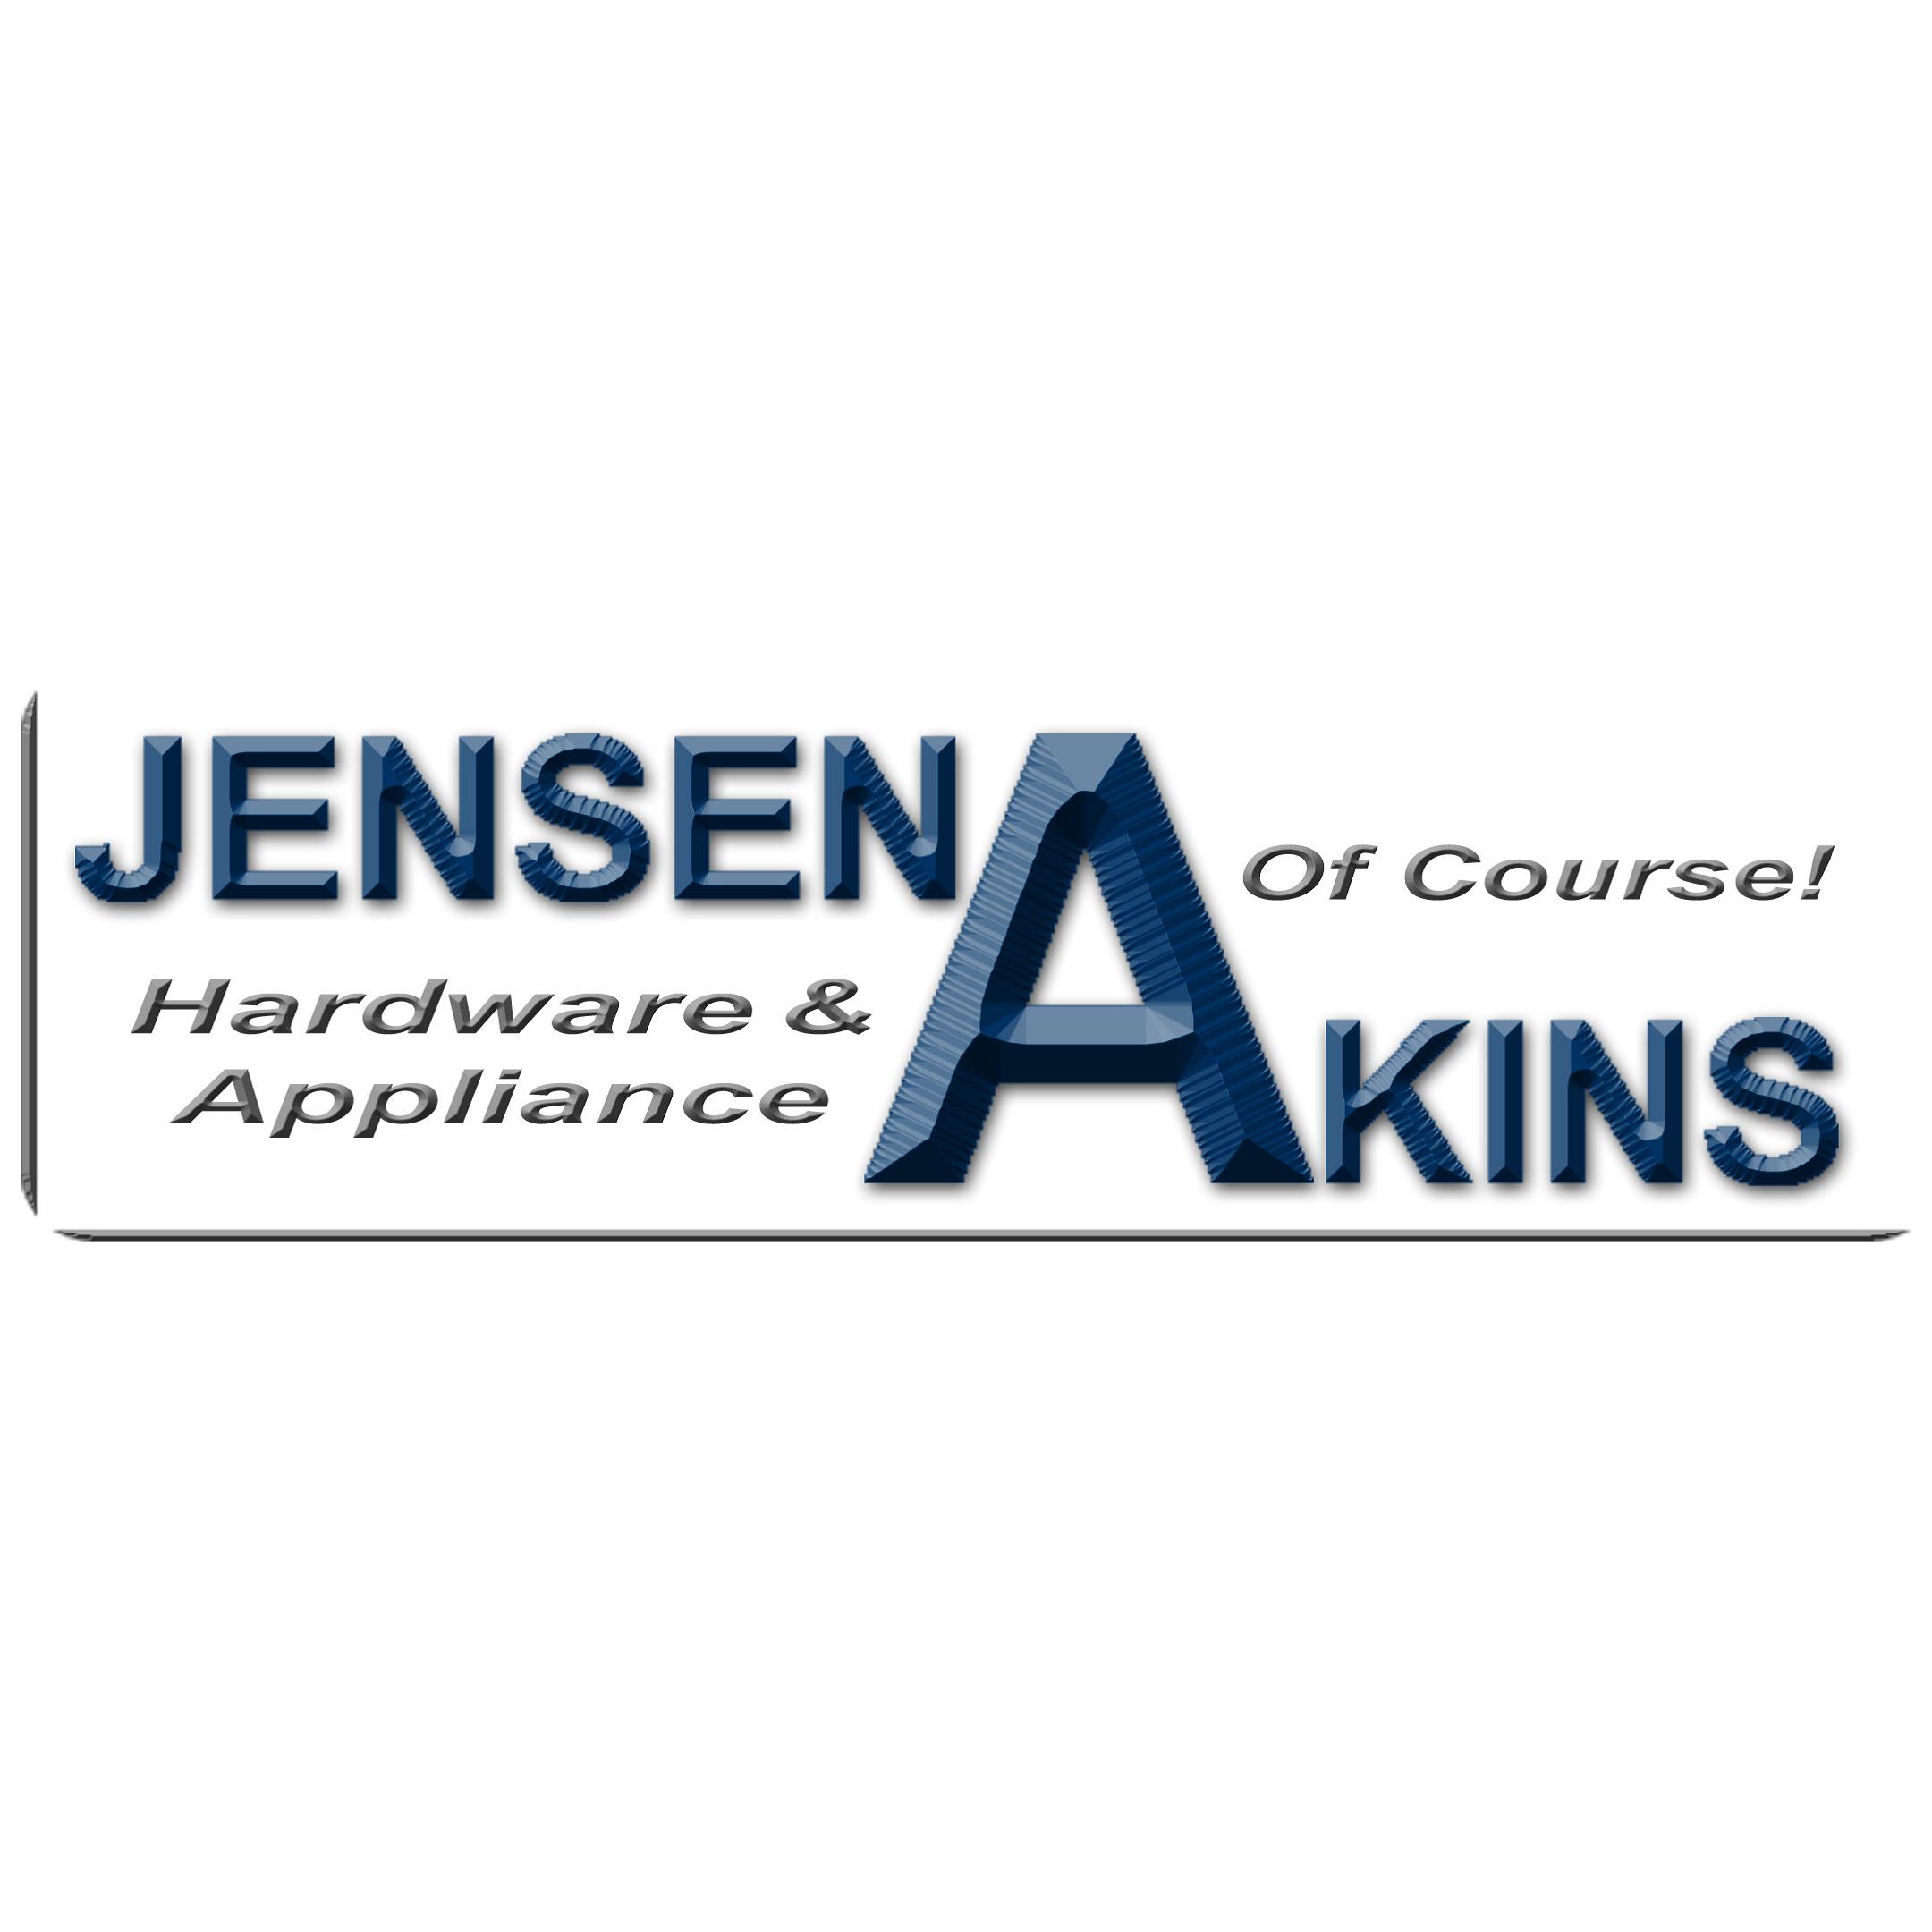 Jensen Akins Hardware and Appliance image 5